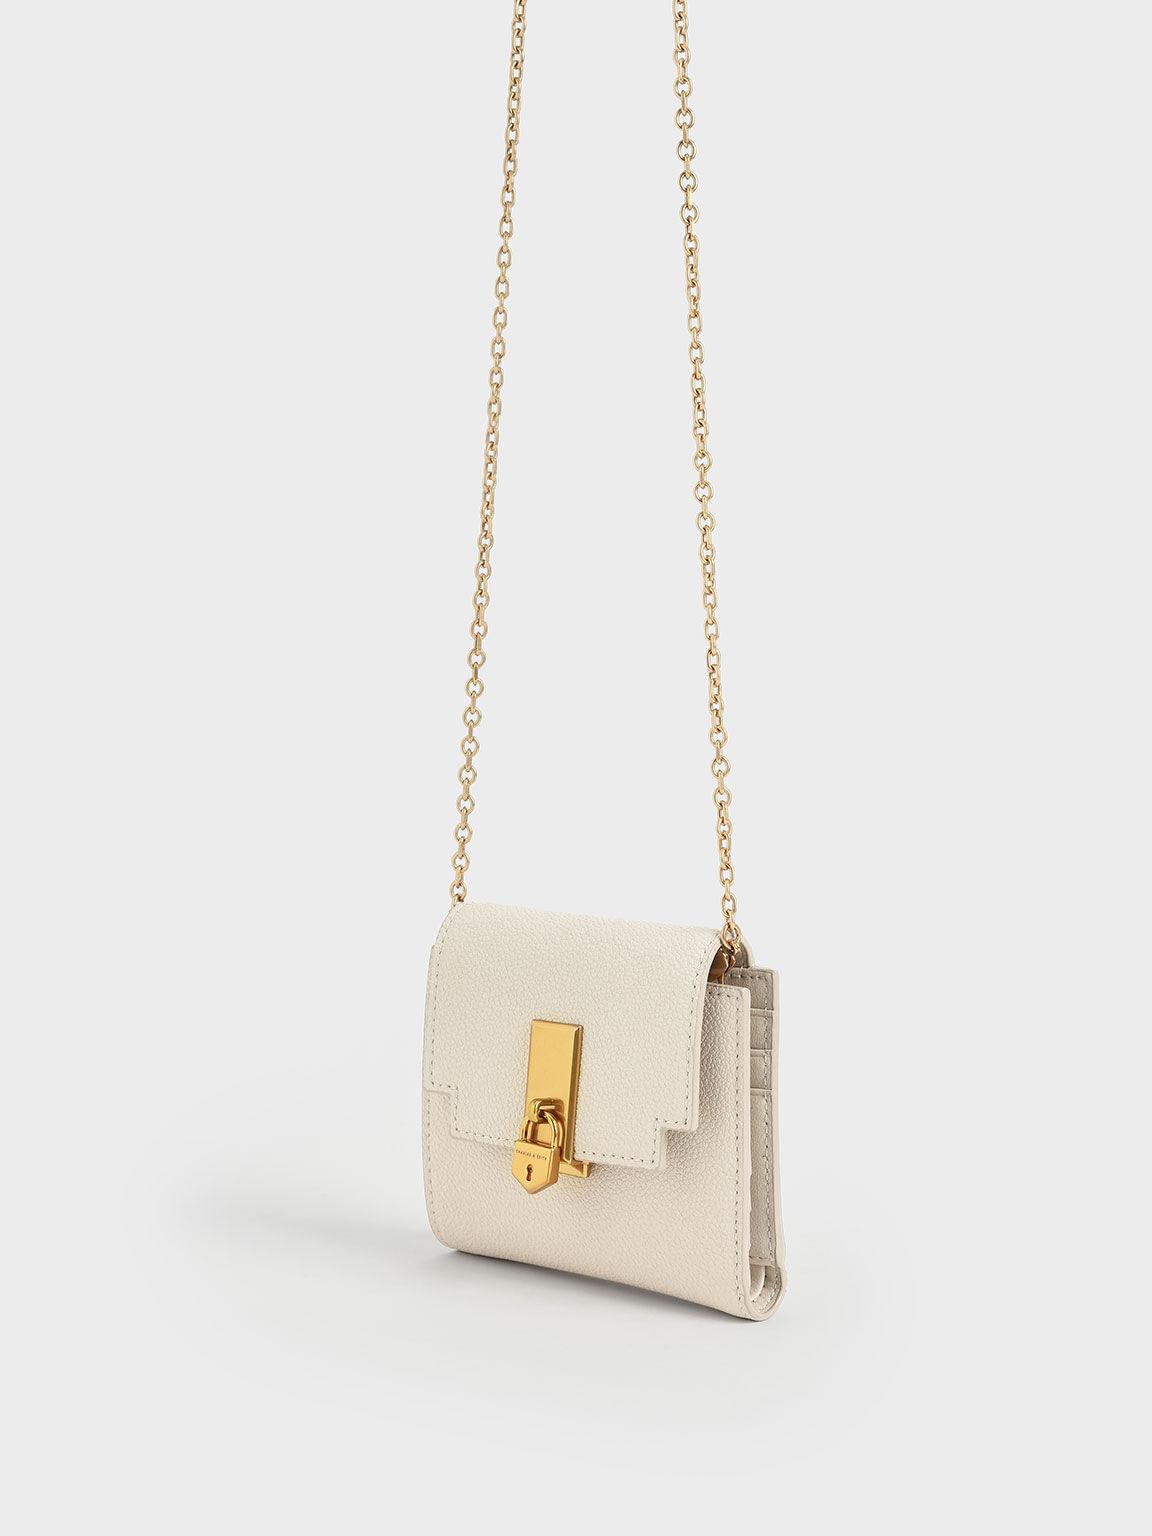 Metallic Push-Lock Short Wallet, Cream, hi-res